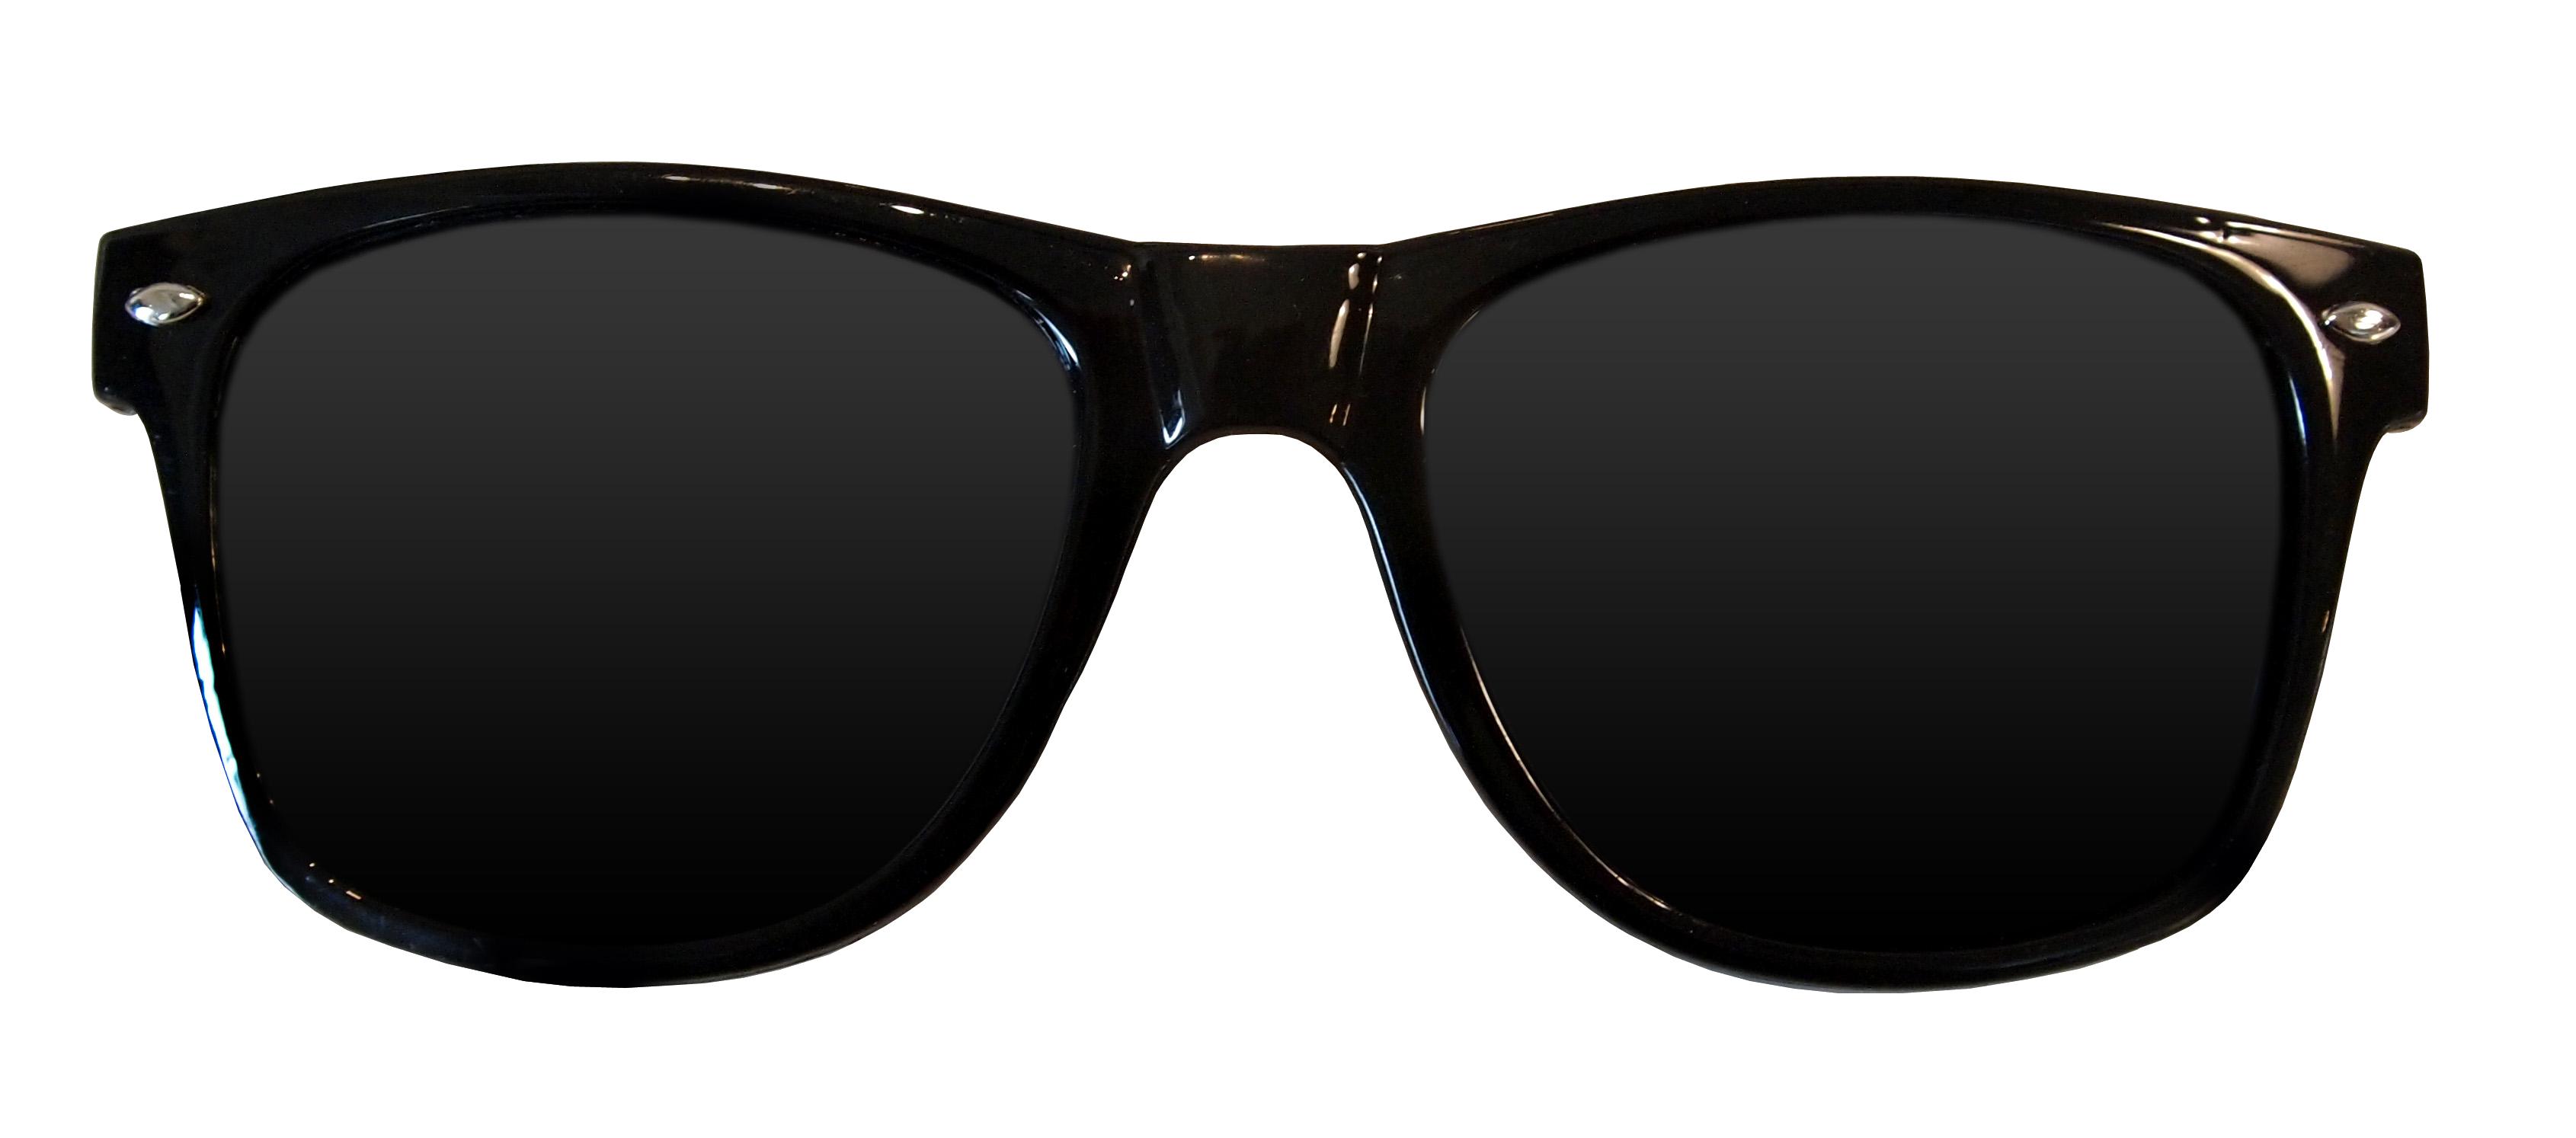 Aviator Sunglass PNG Clipart, Sunglass PNG - Free PNG